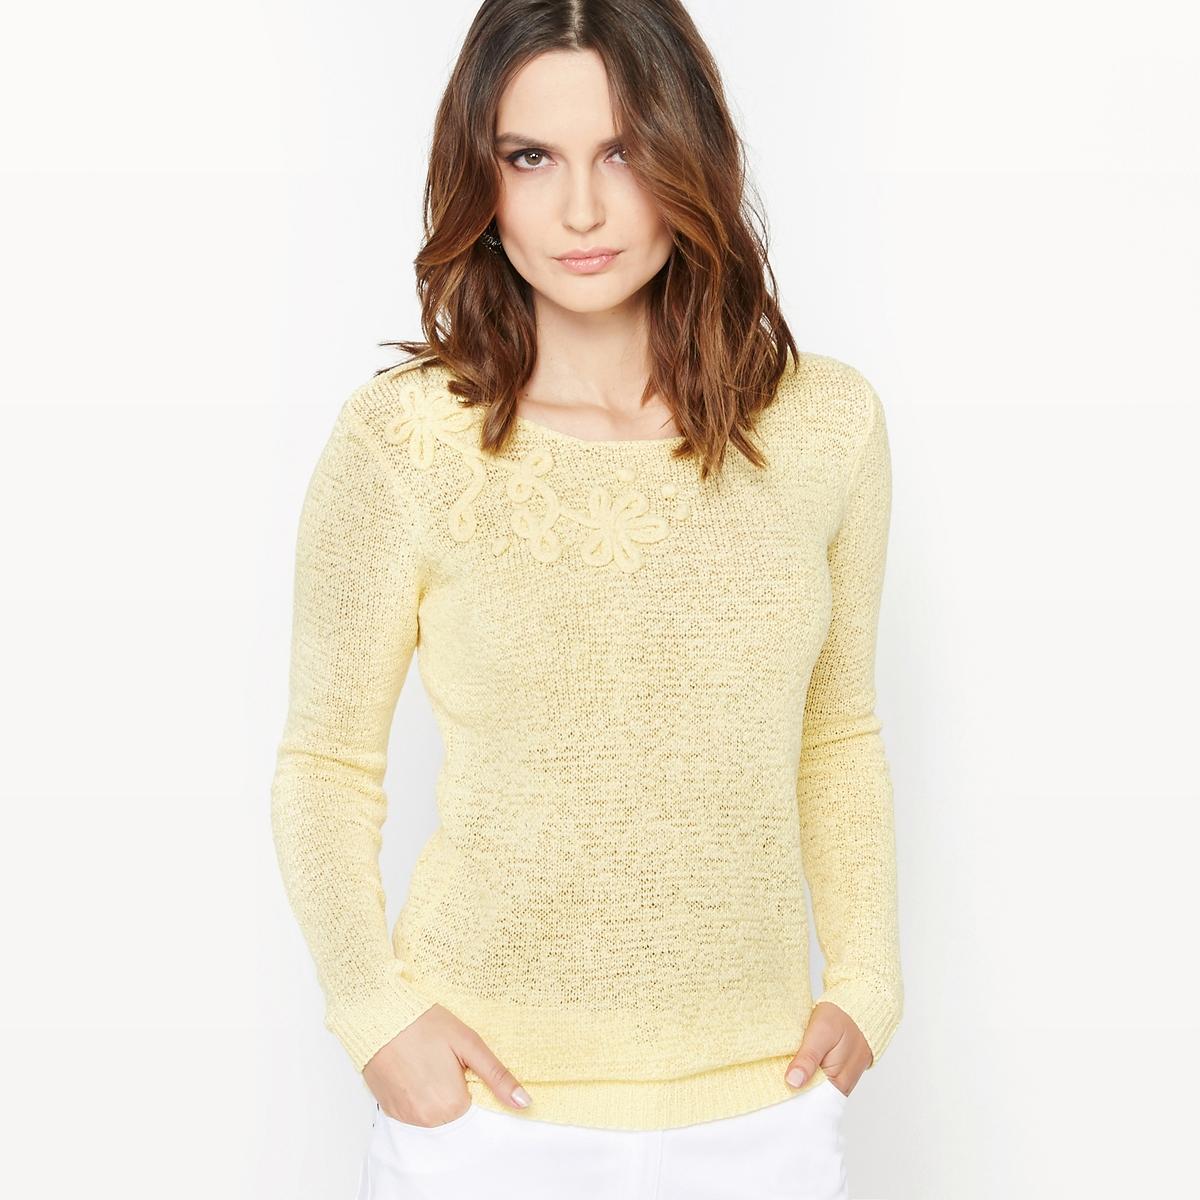 Пуловер ANNE WEYBURN 35061 от LaRedoute